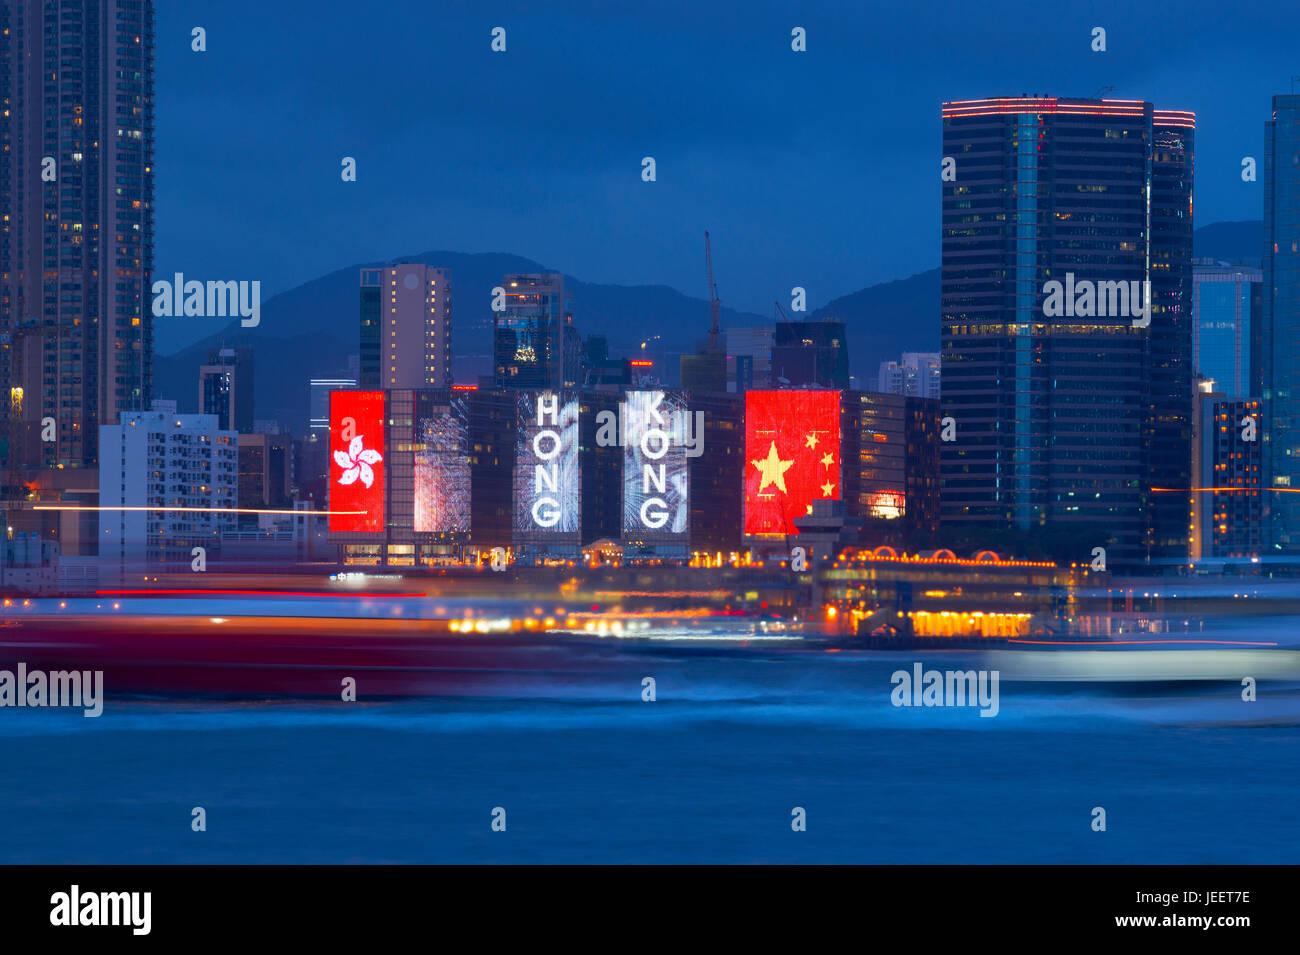 Hong Kong decorations along Victoria harbor celebrating the handover of Hong Kong from the United Kingdom to Mainland - Stock Image